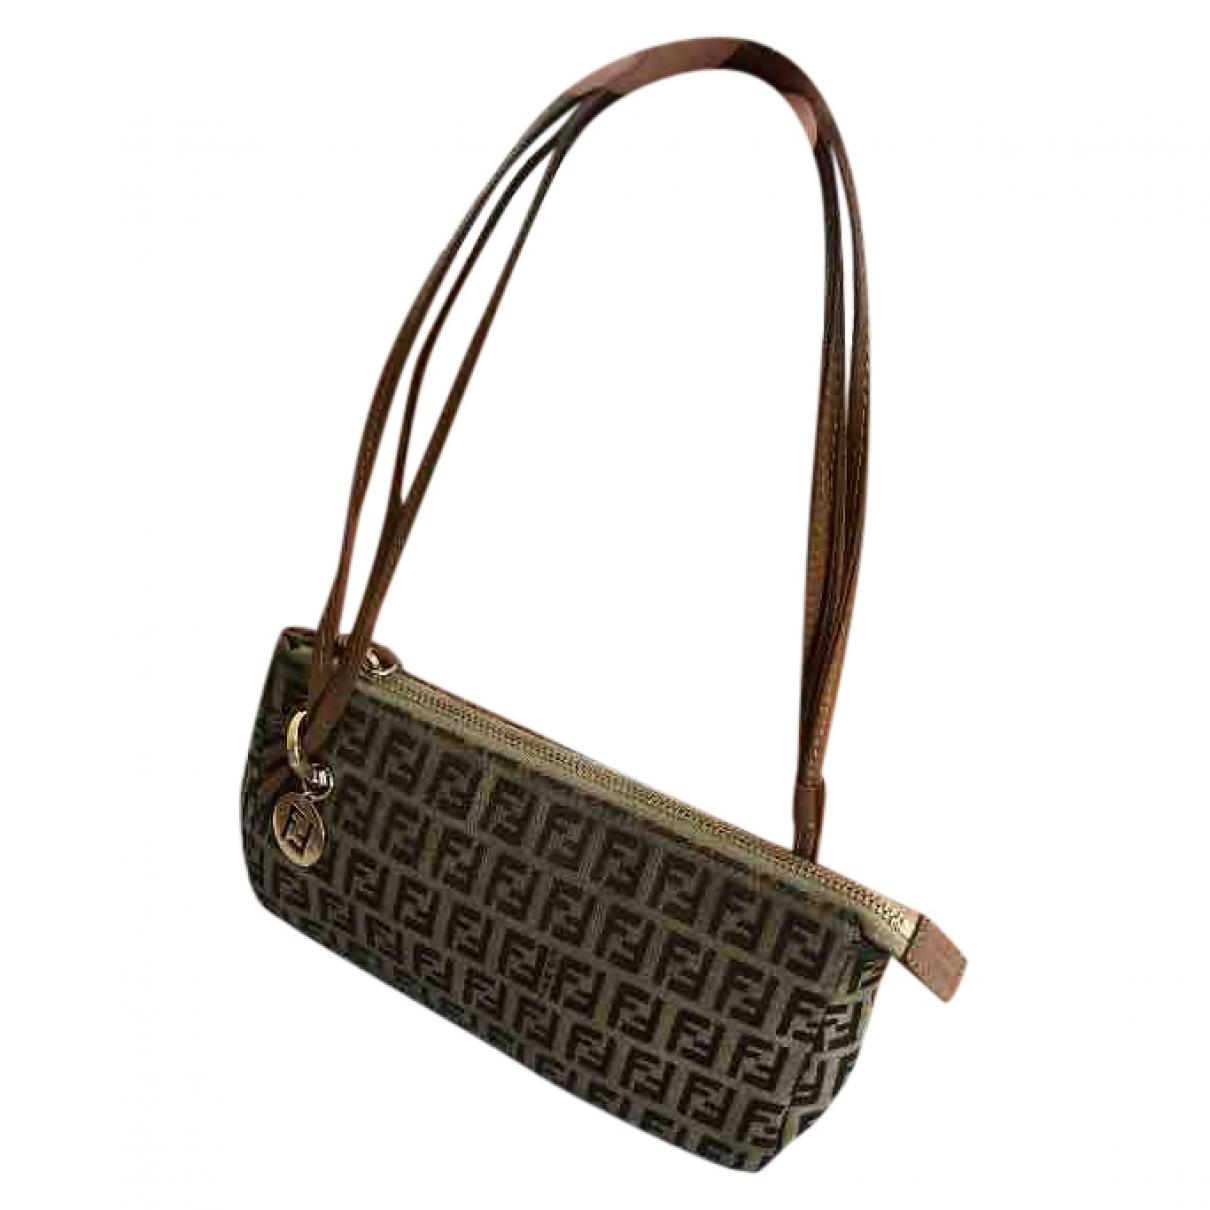 Fendi \N Beige Cloth Clutch bag for Women \N